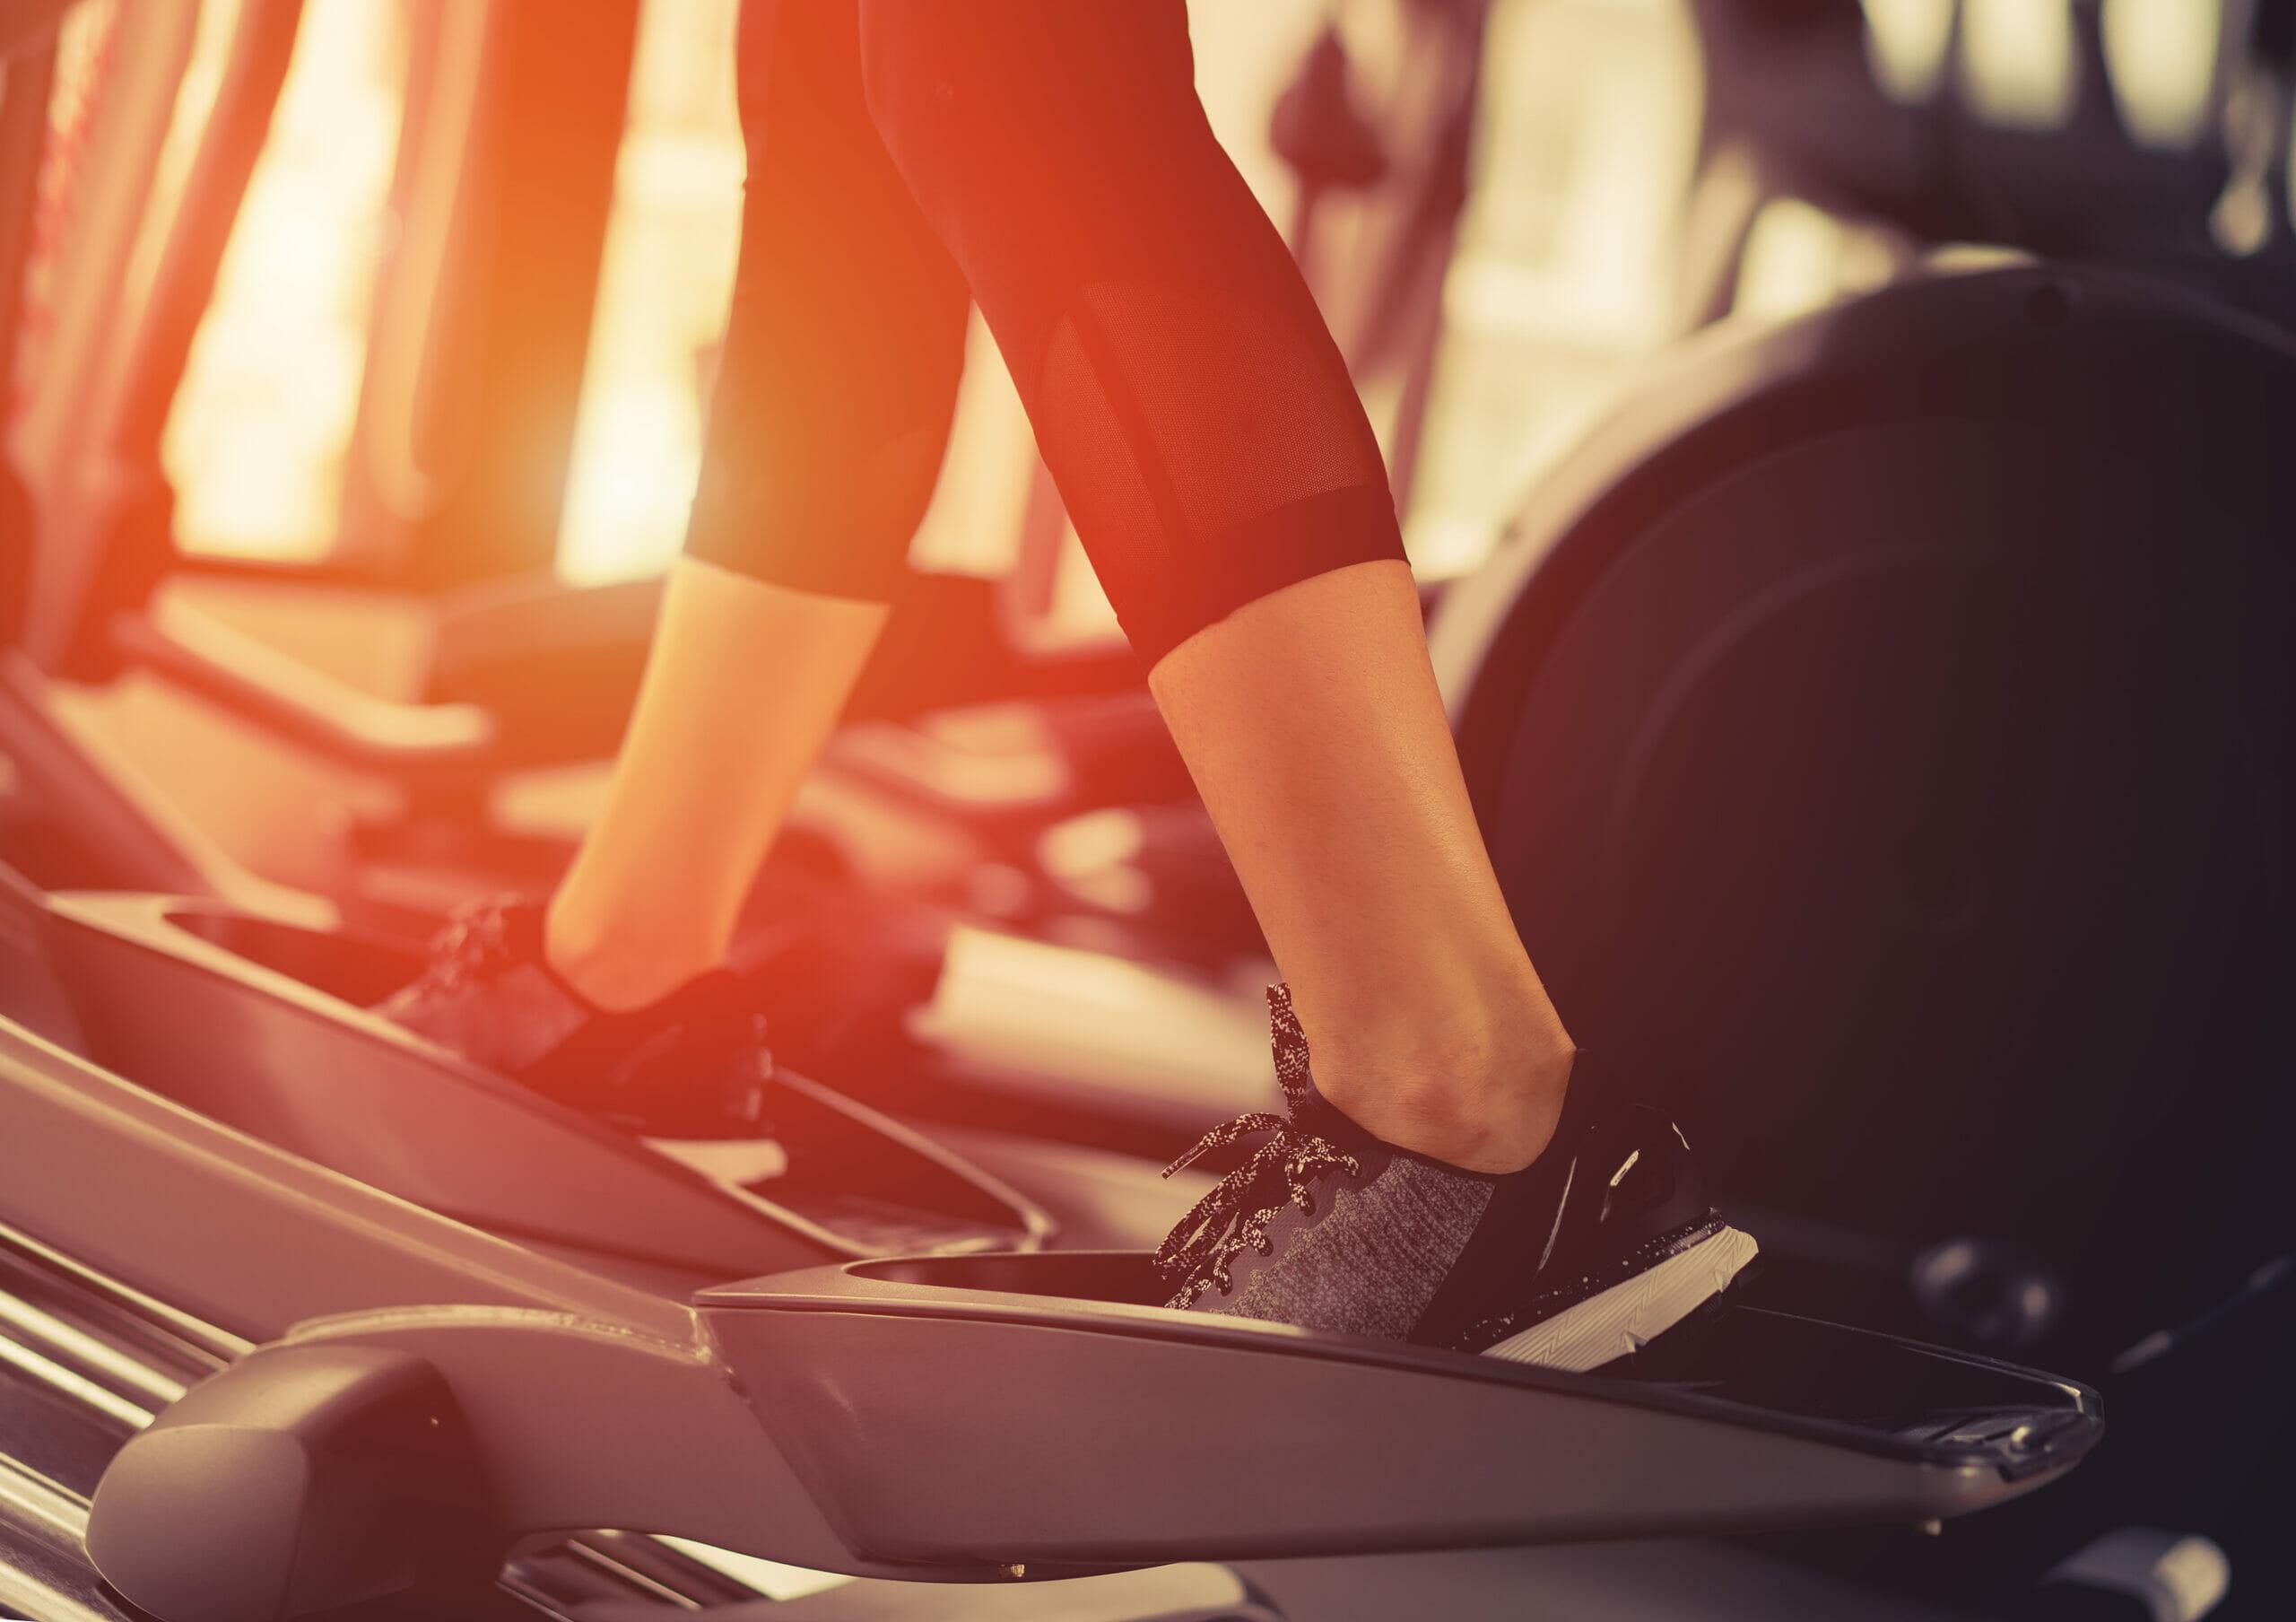 spirit fitness xe295 elliptical review